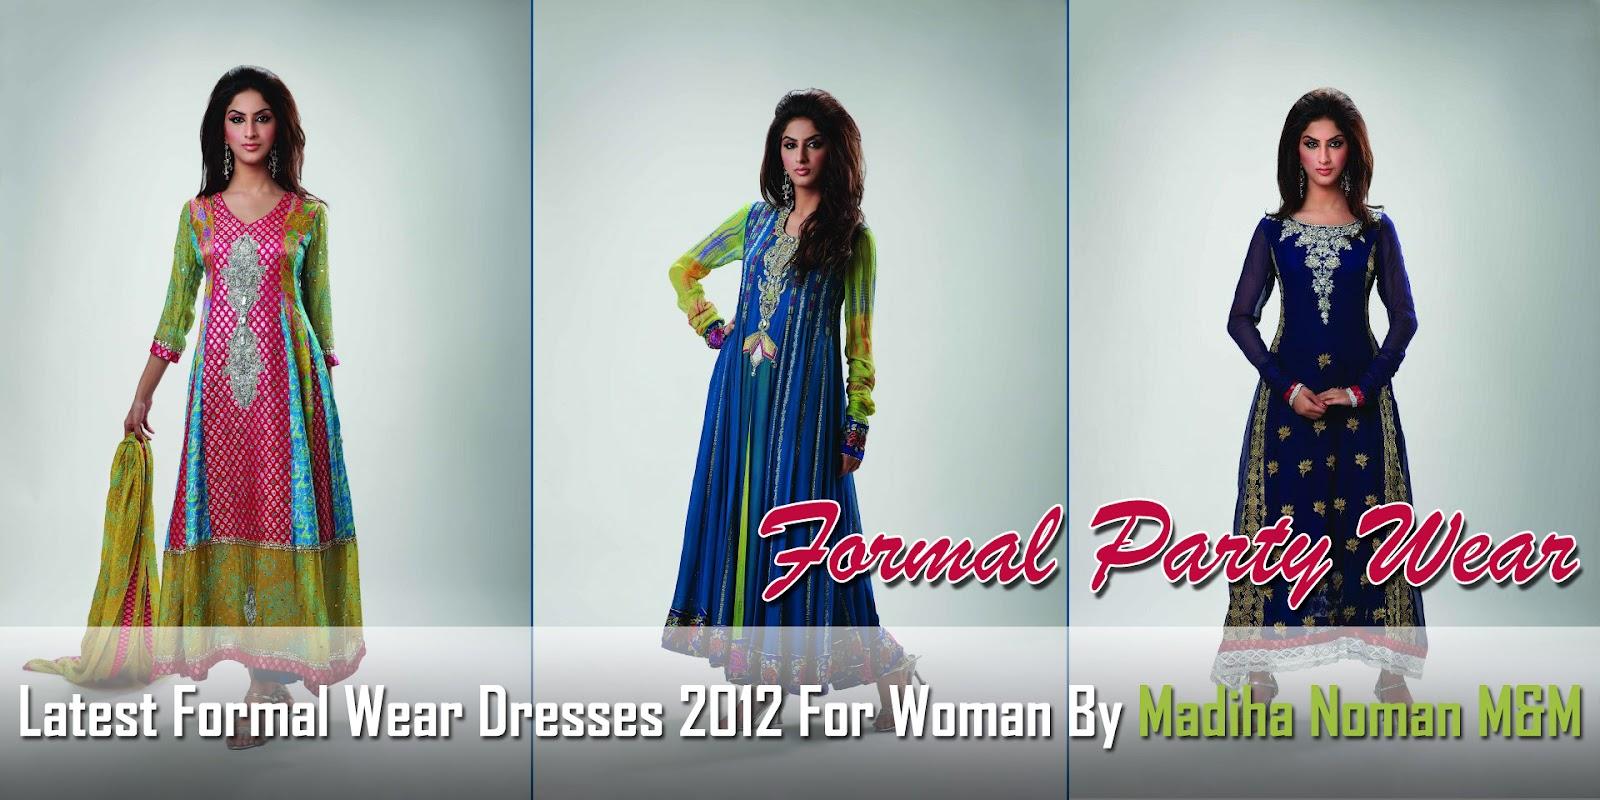 Latest Formal Wear Dresses 2012 For Womans By Madiha Noman MandM ...